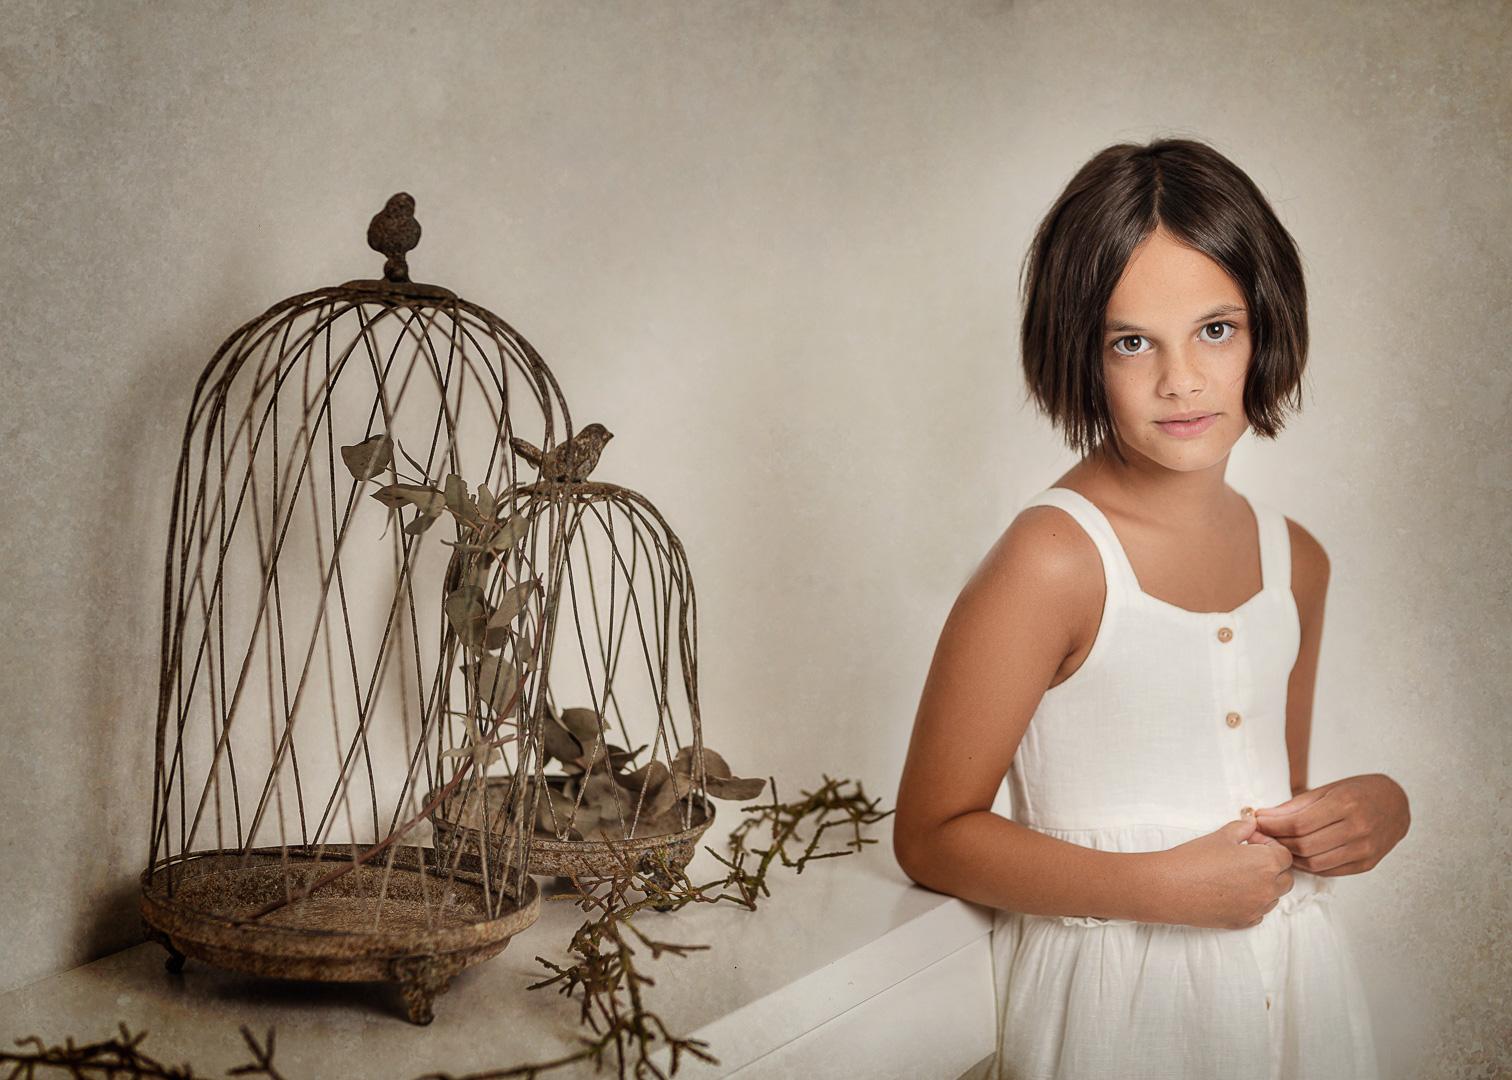 Fotos de niños hn fotógrafo colmenar viejo